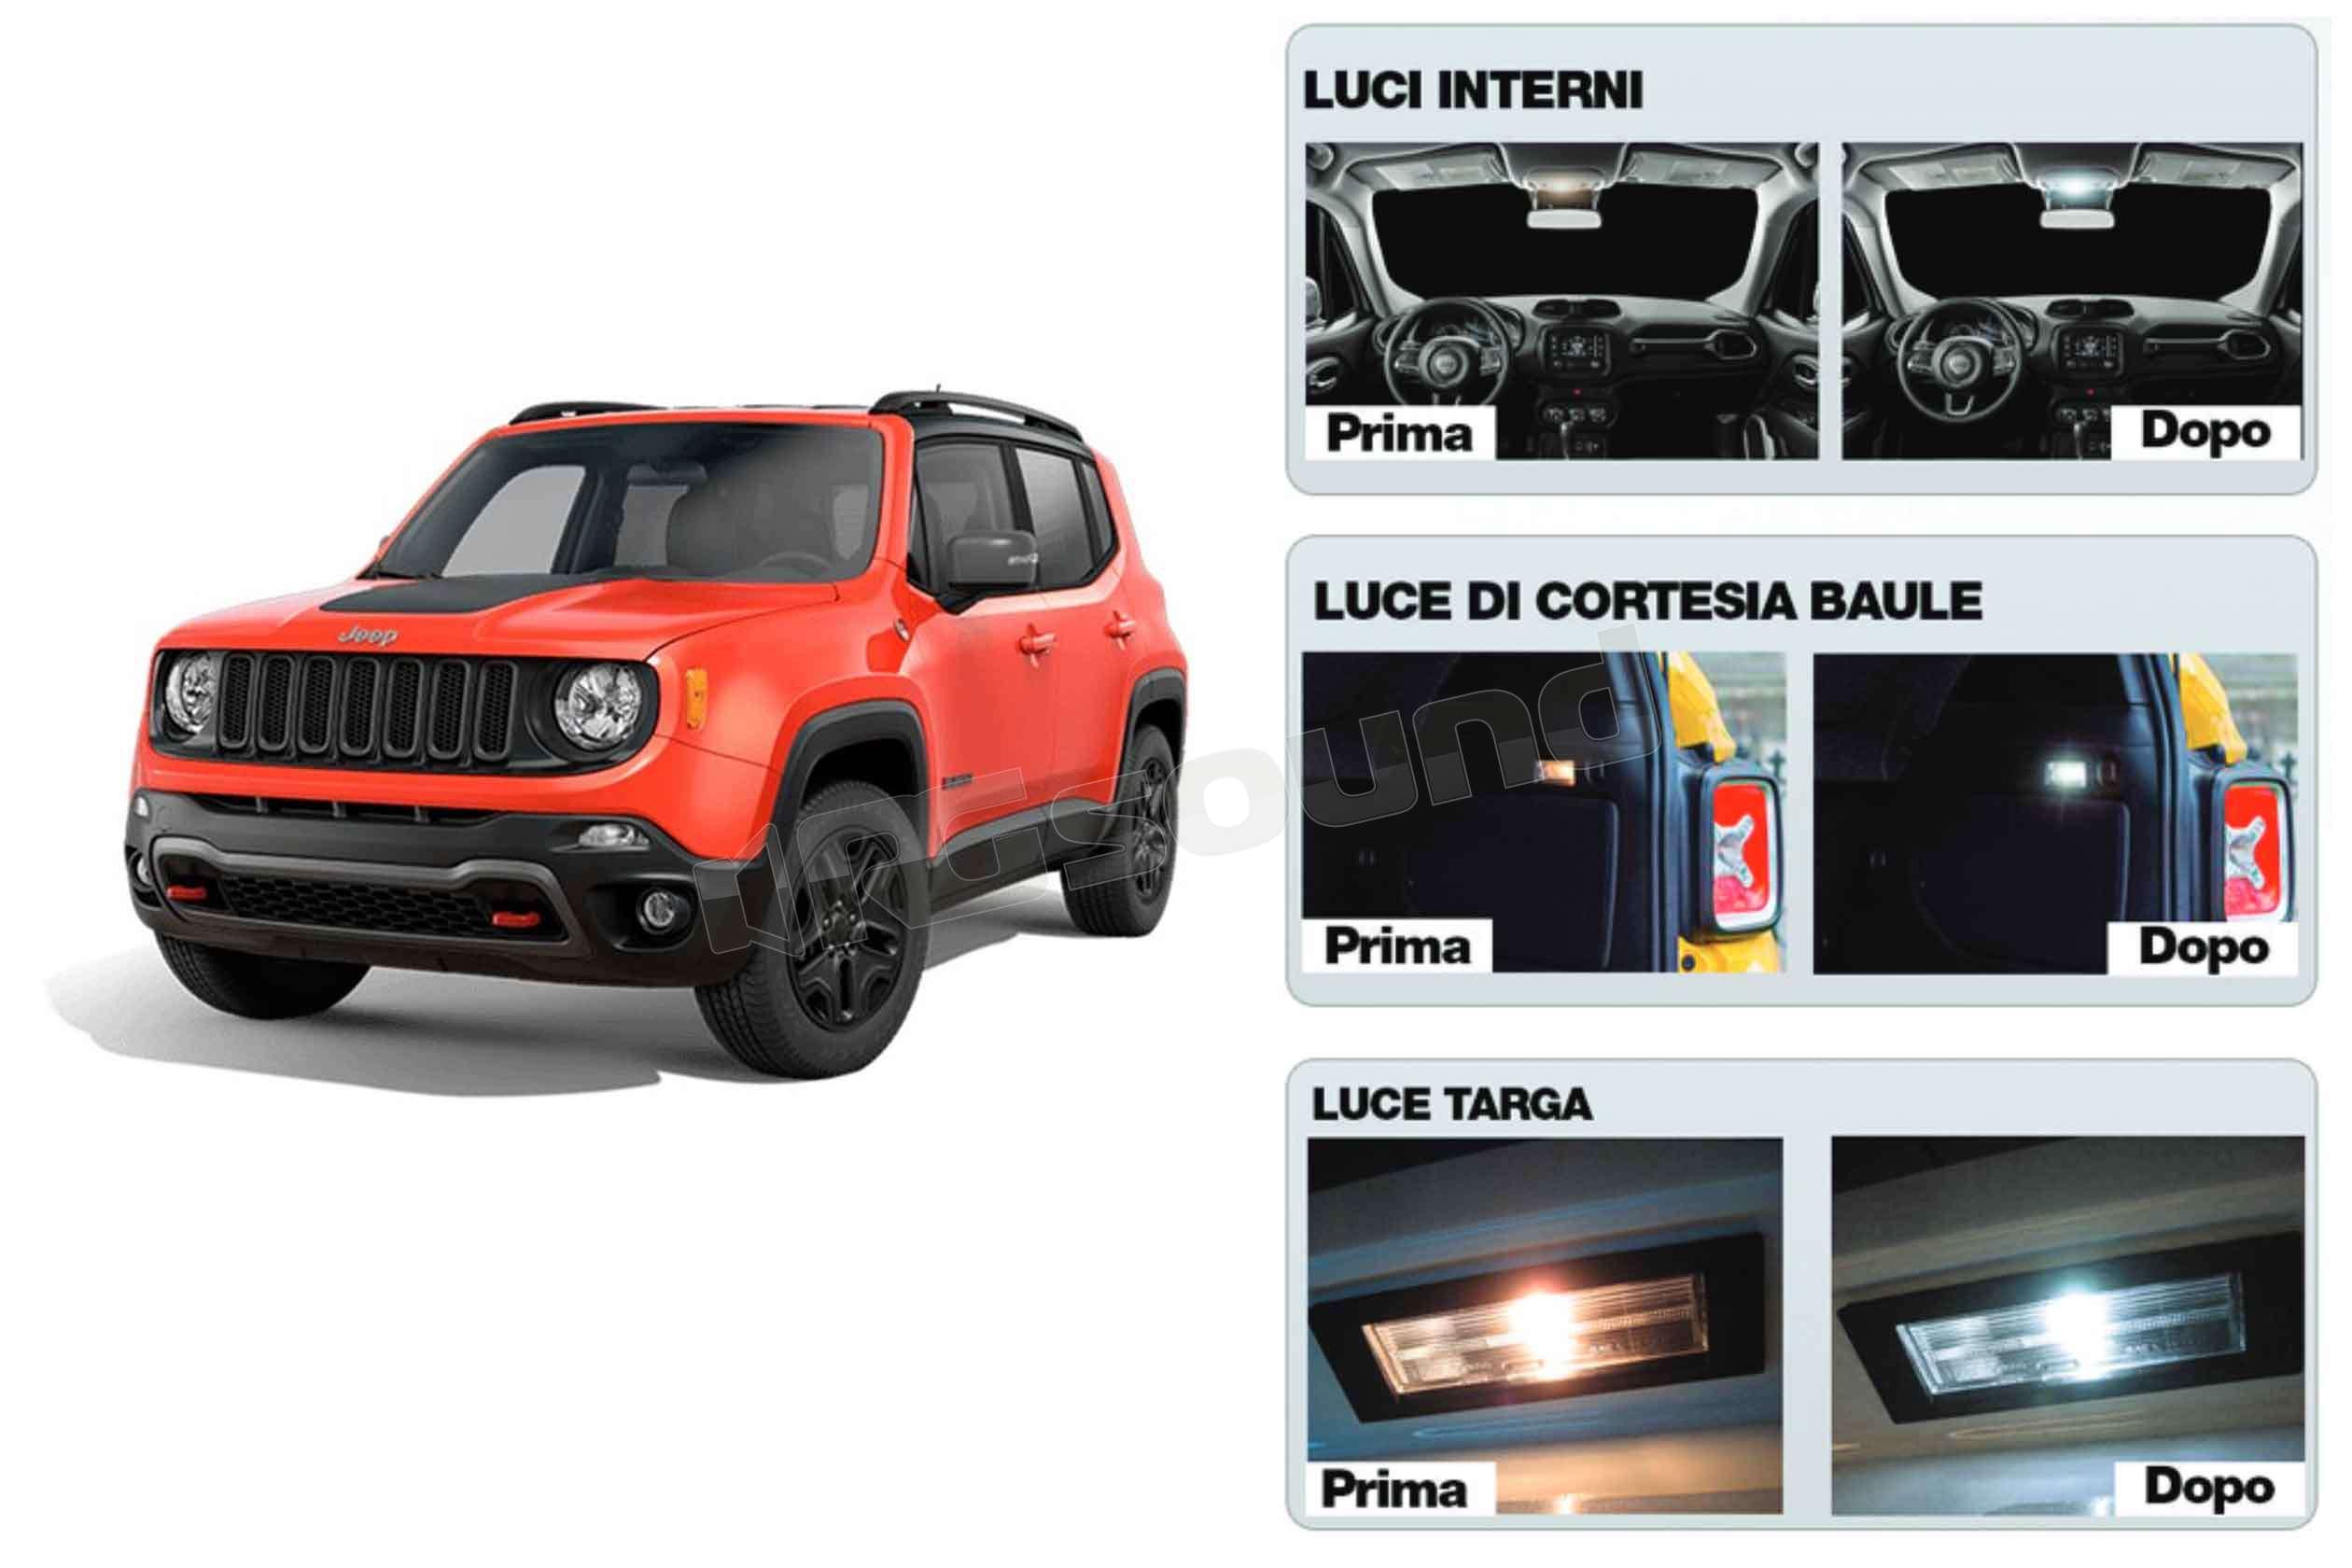 Plafoniere Interne Per Camper : Simoni racing rene int kit luci interni per jeep renegade